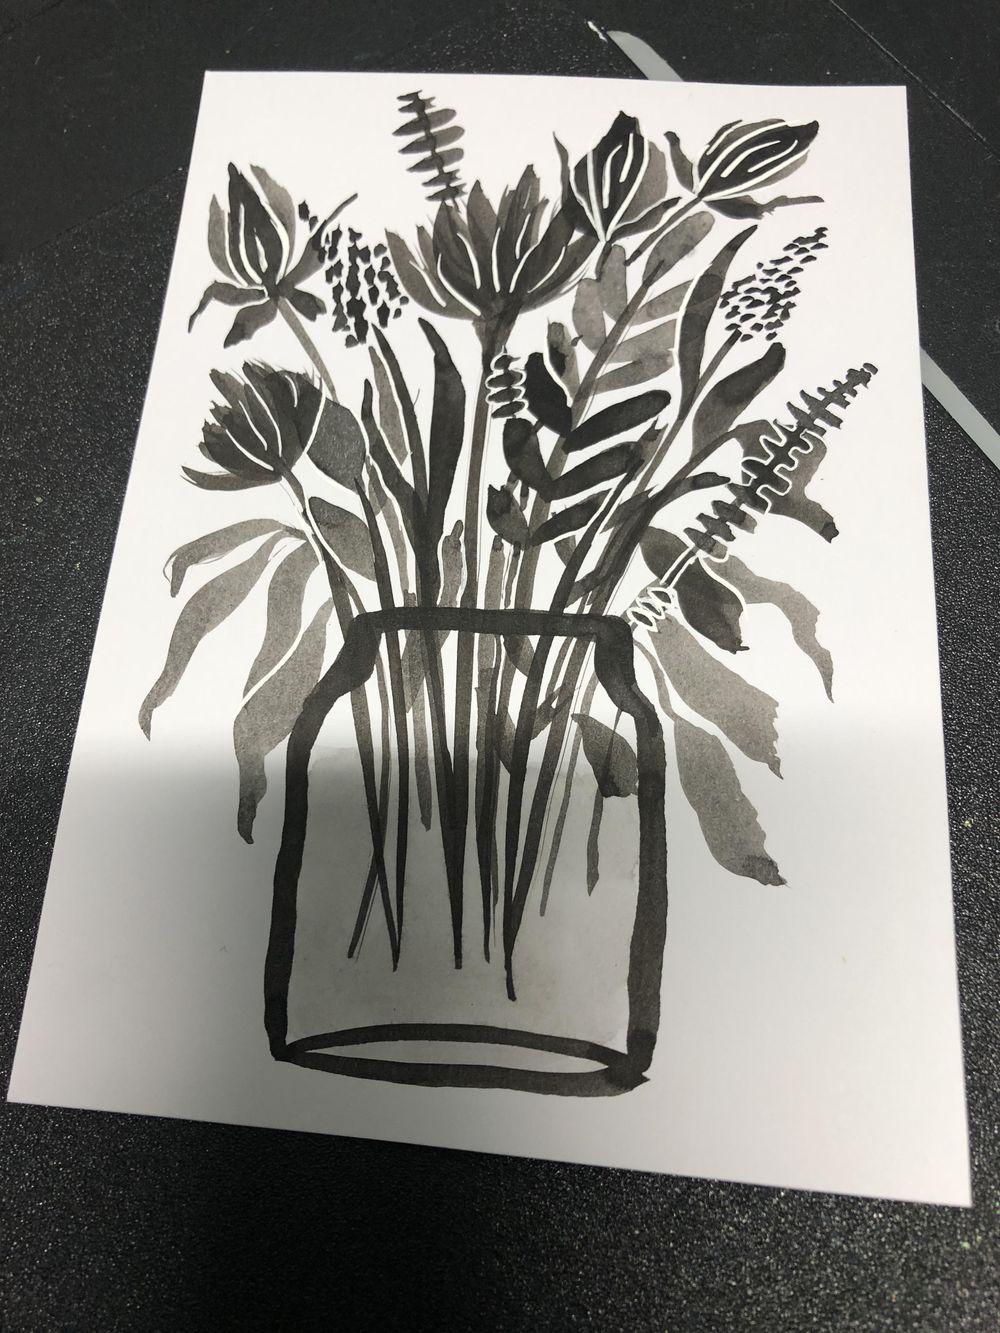 Black Botanicals - image 2 - student project